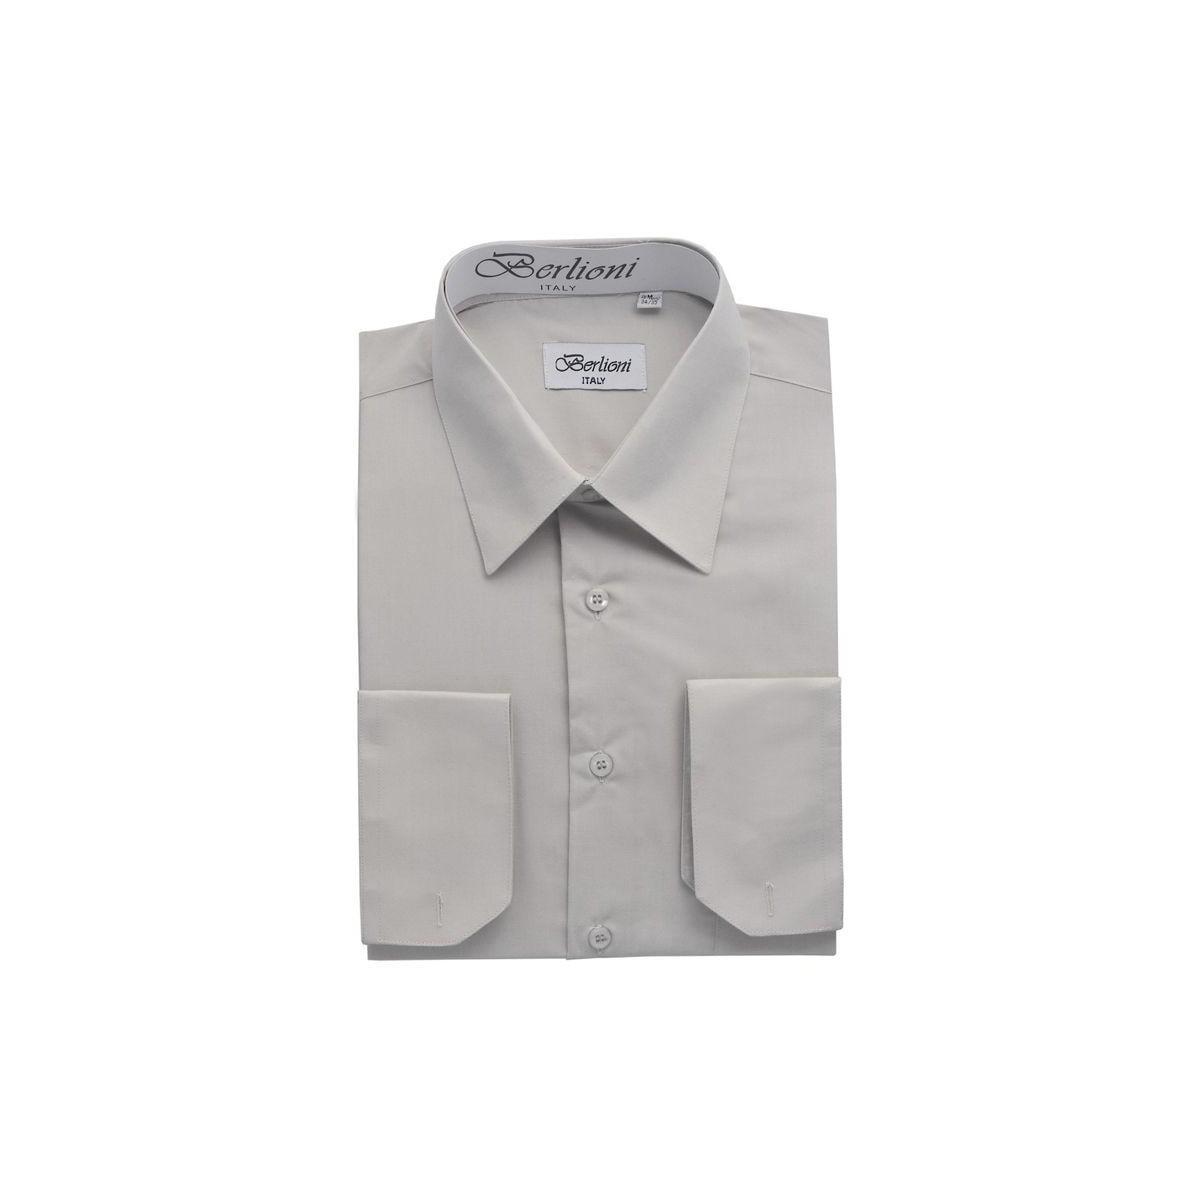 16 1//2 32-33 Men/'s cream color long sleeves dress shirts